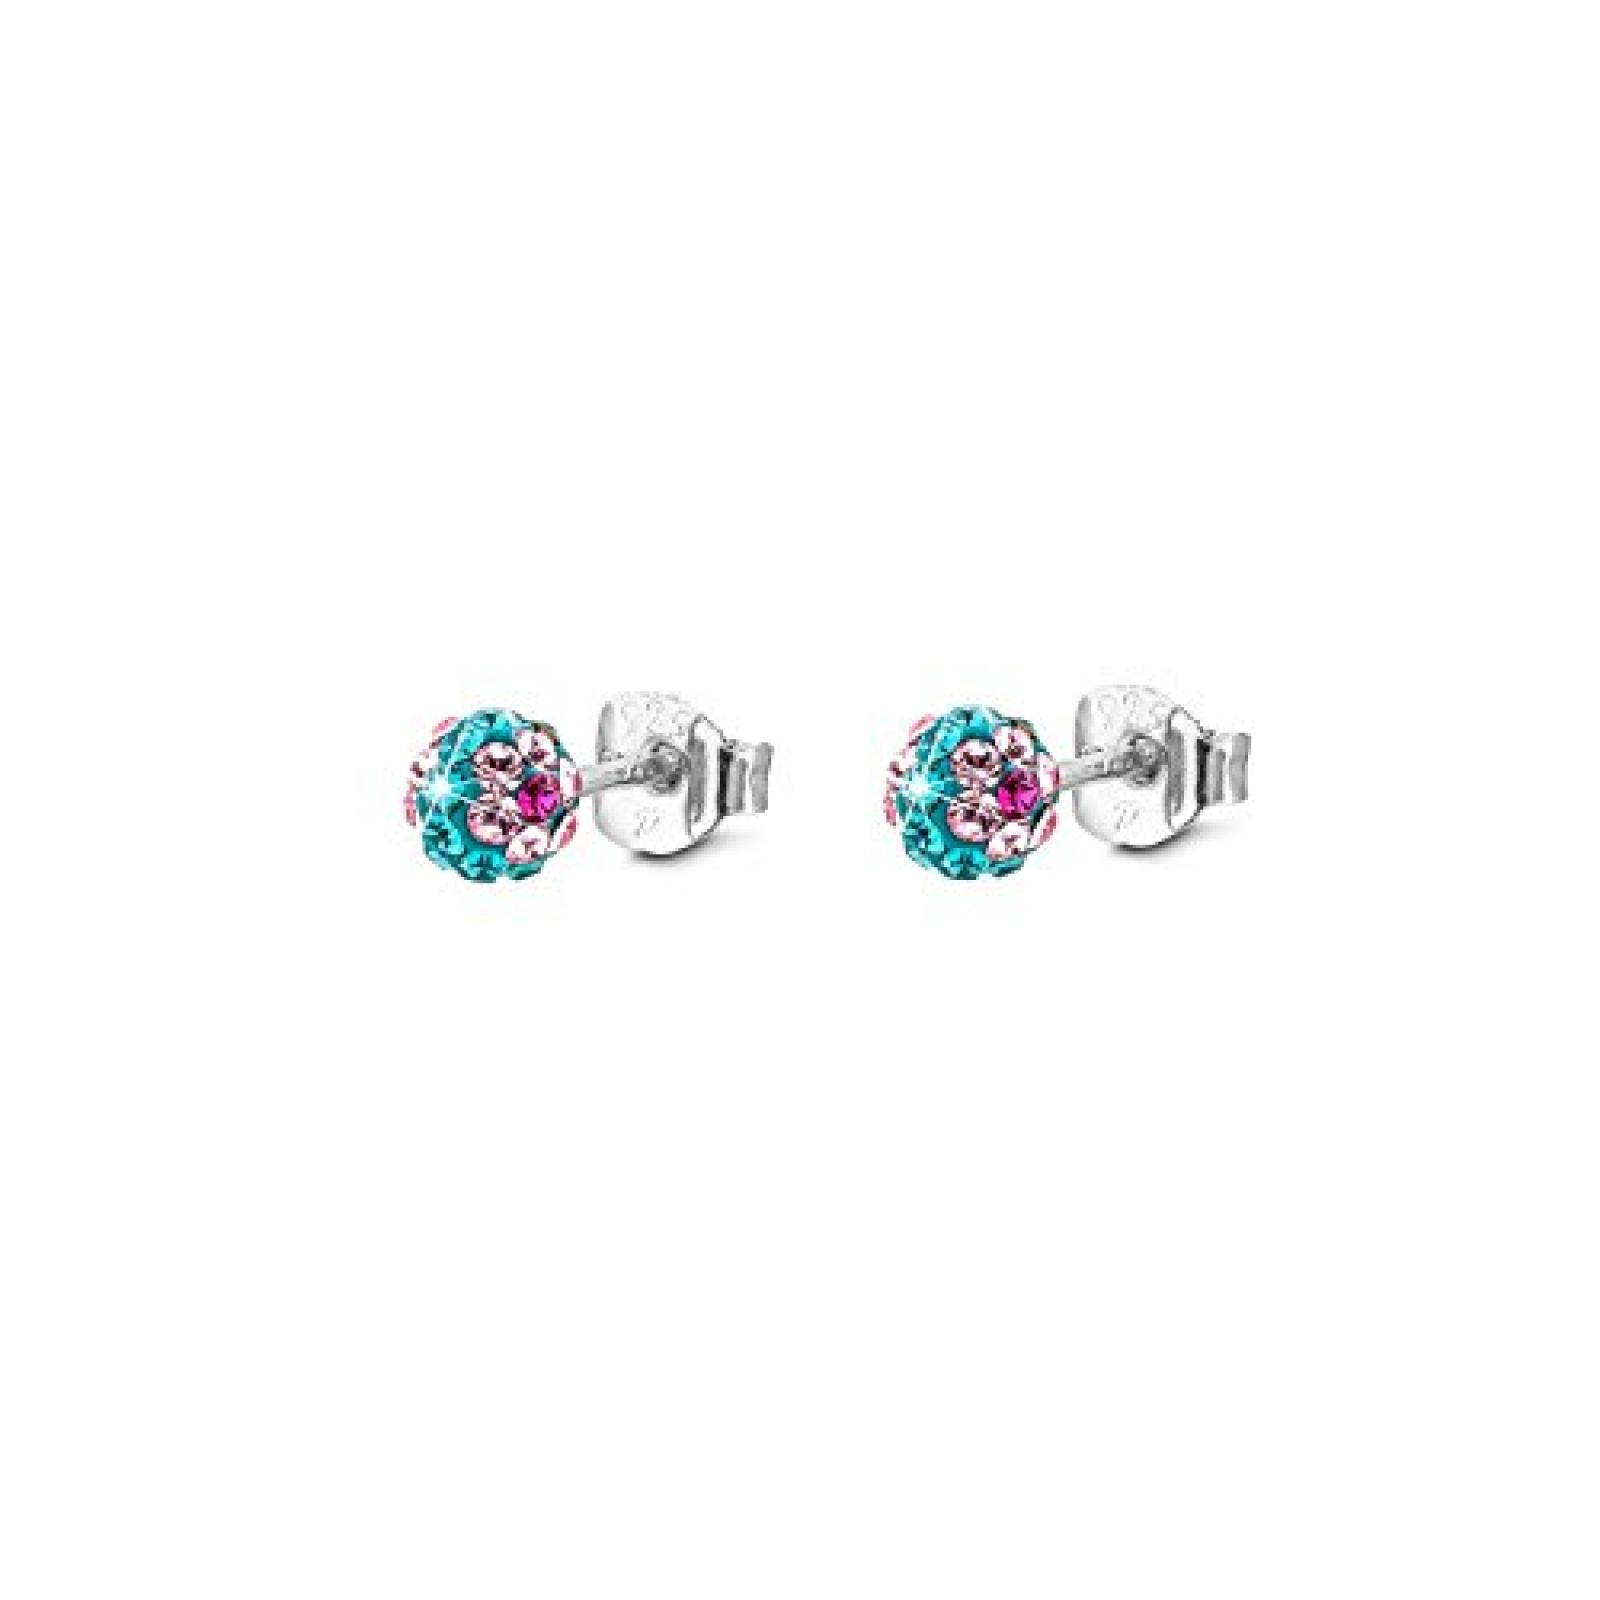 s.Oliver Kinder-Ohrstecker Swarovski 925 Silber rhodiniert rosa Kristall - 487245